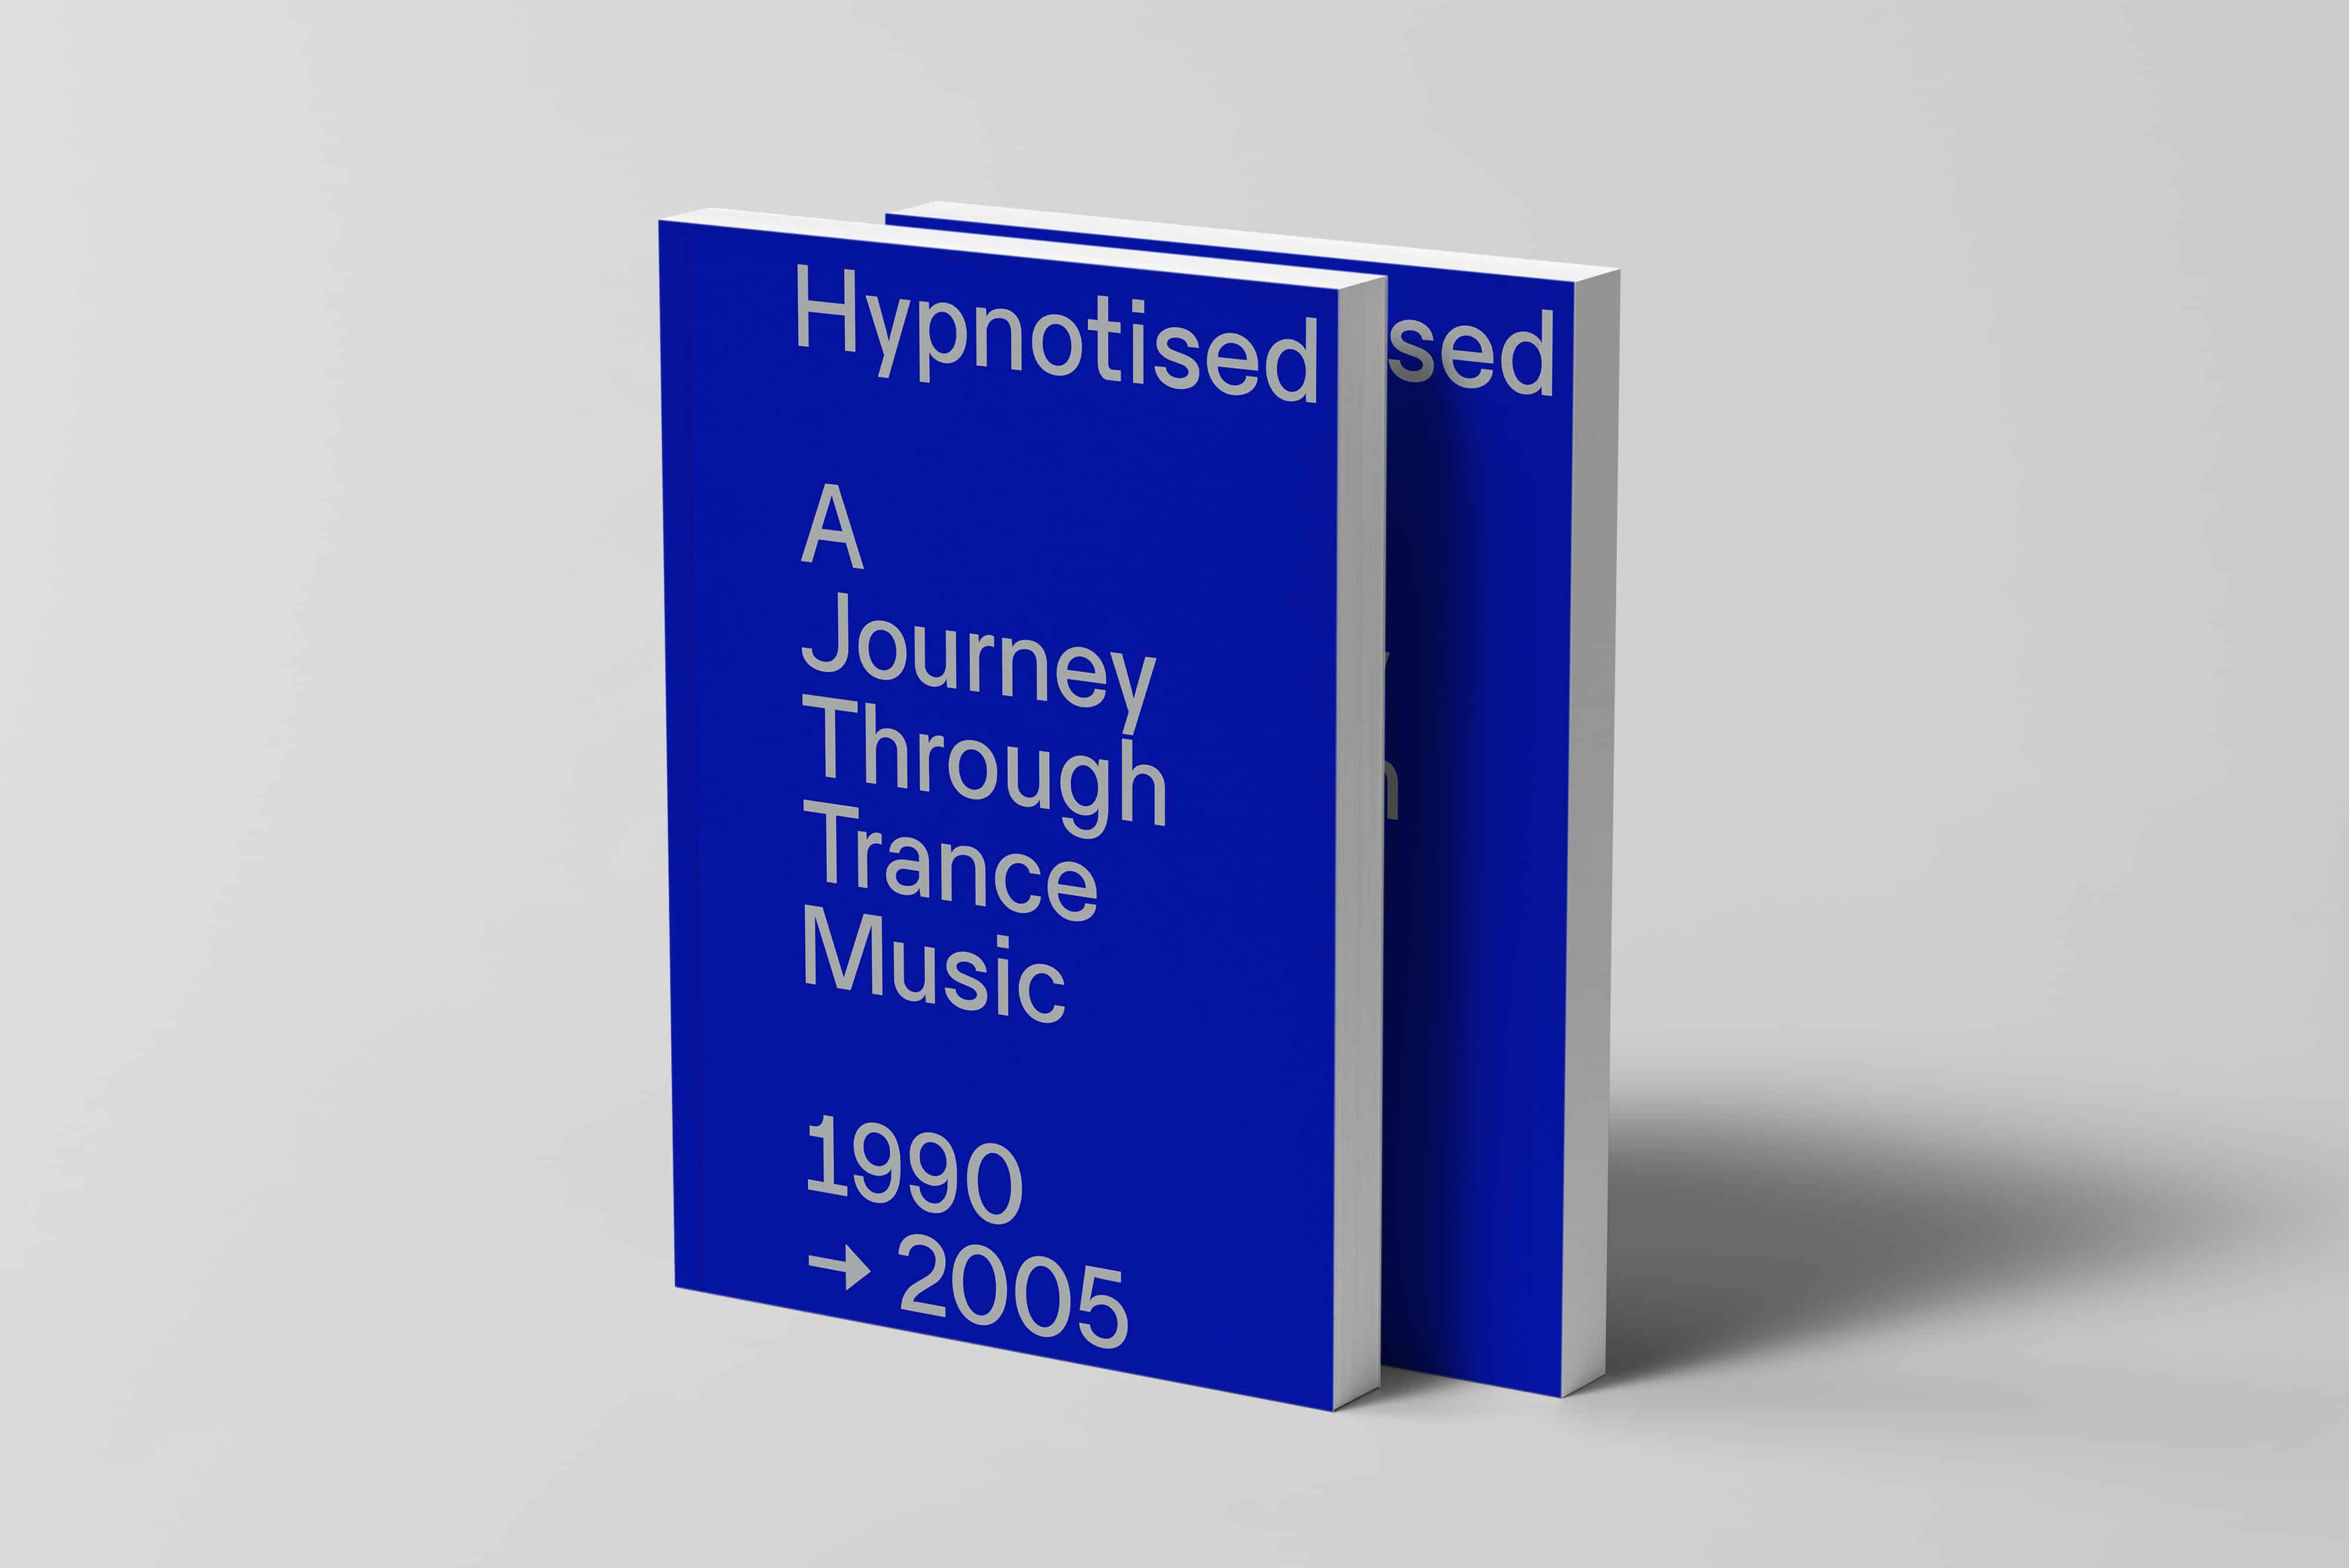 Hypnotised - A Journey Through Trance